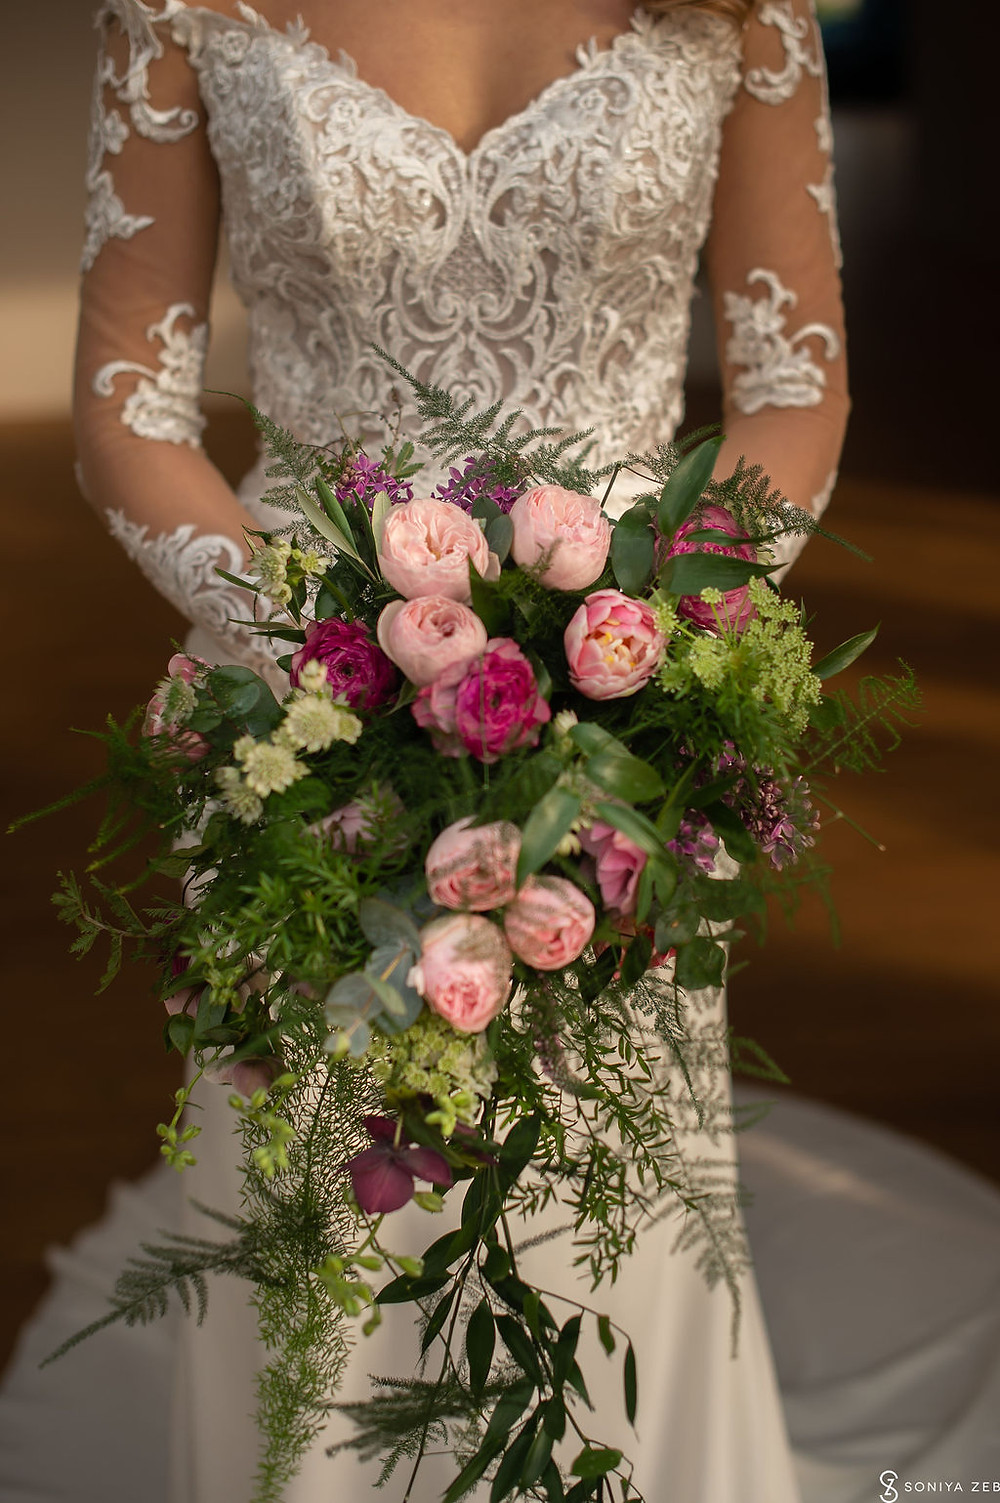 Trailing Cascading Bridal bouquet wedding flowers at Harewood House Yorkshire . Image by Soniya Zeb PHotography